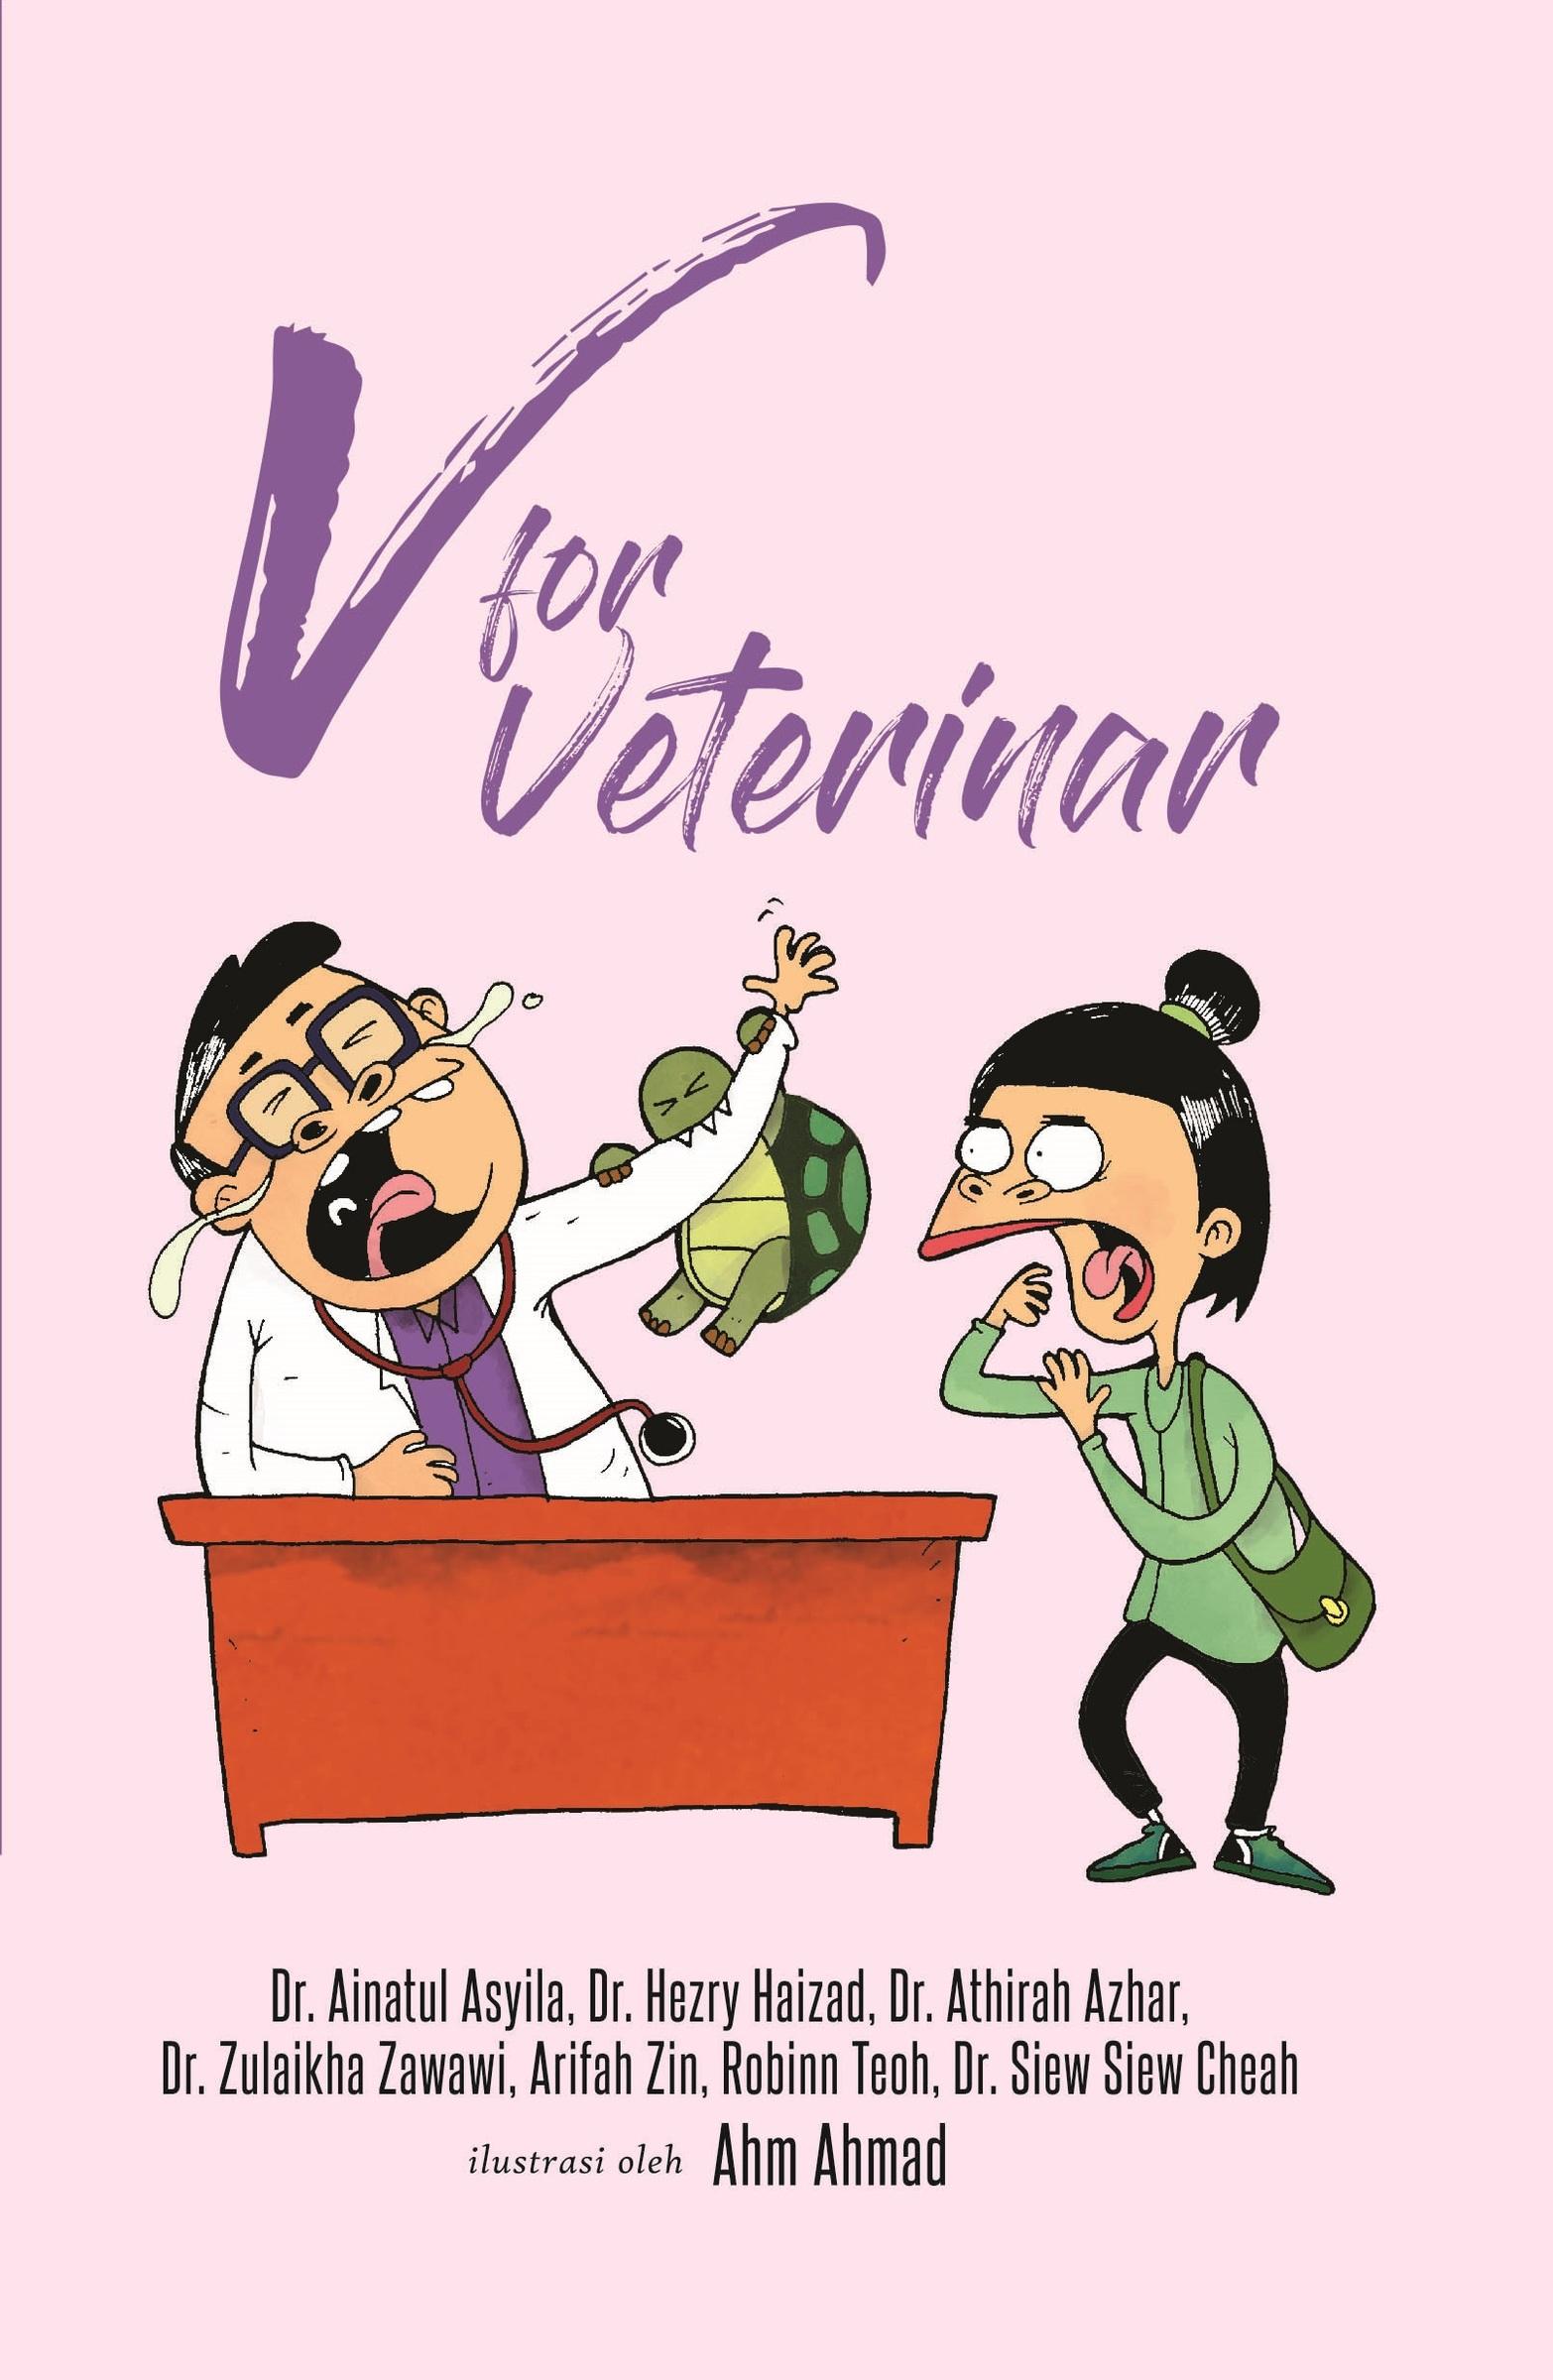 Veterinar_9Apr17-OL.jpg